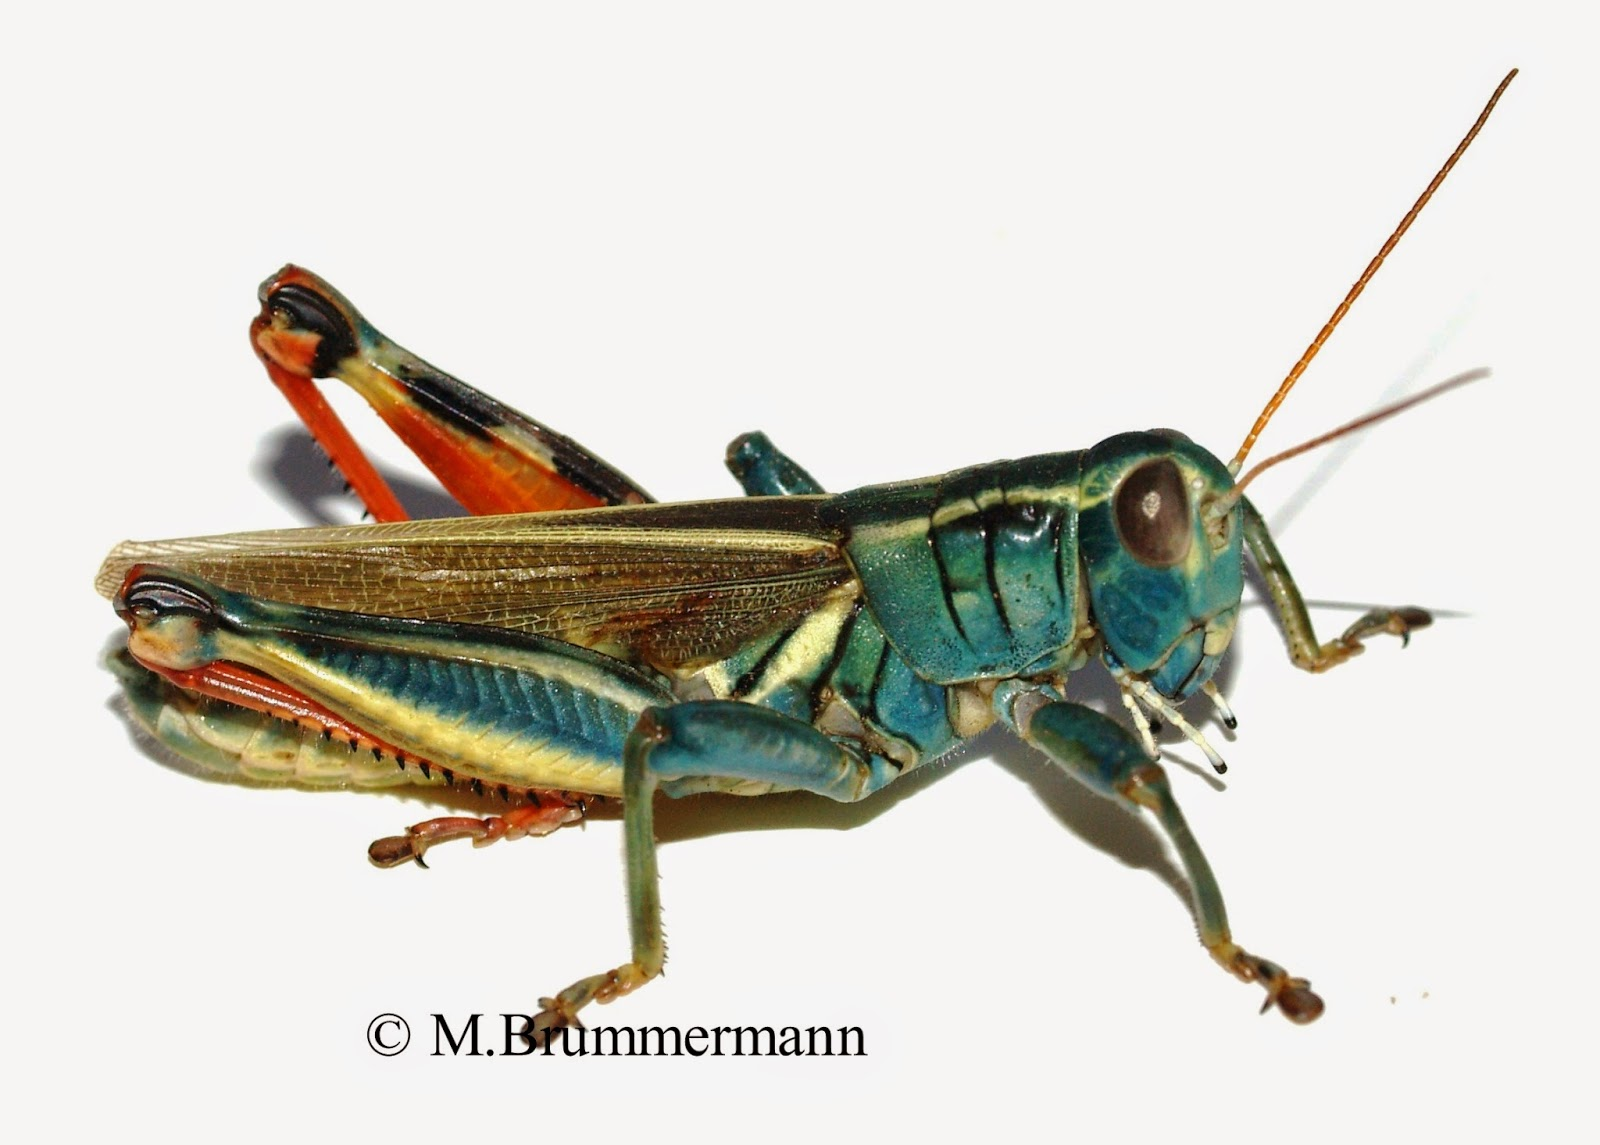 U.s. Grasshoppers Arizona: Beetles, Bugs...